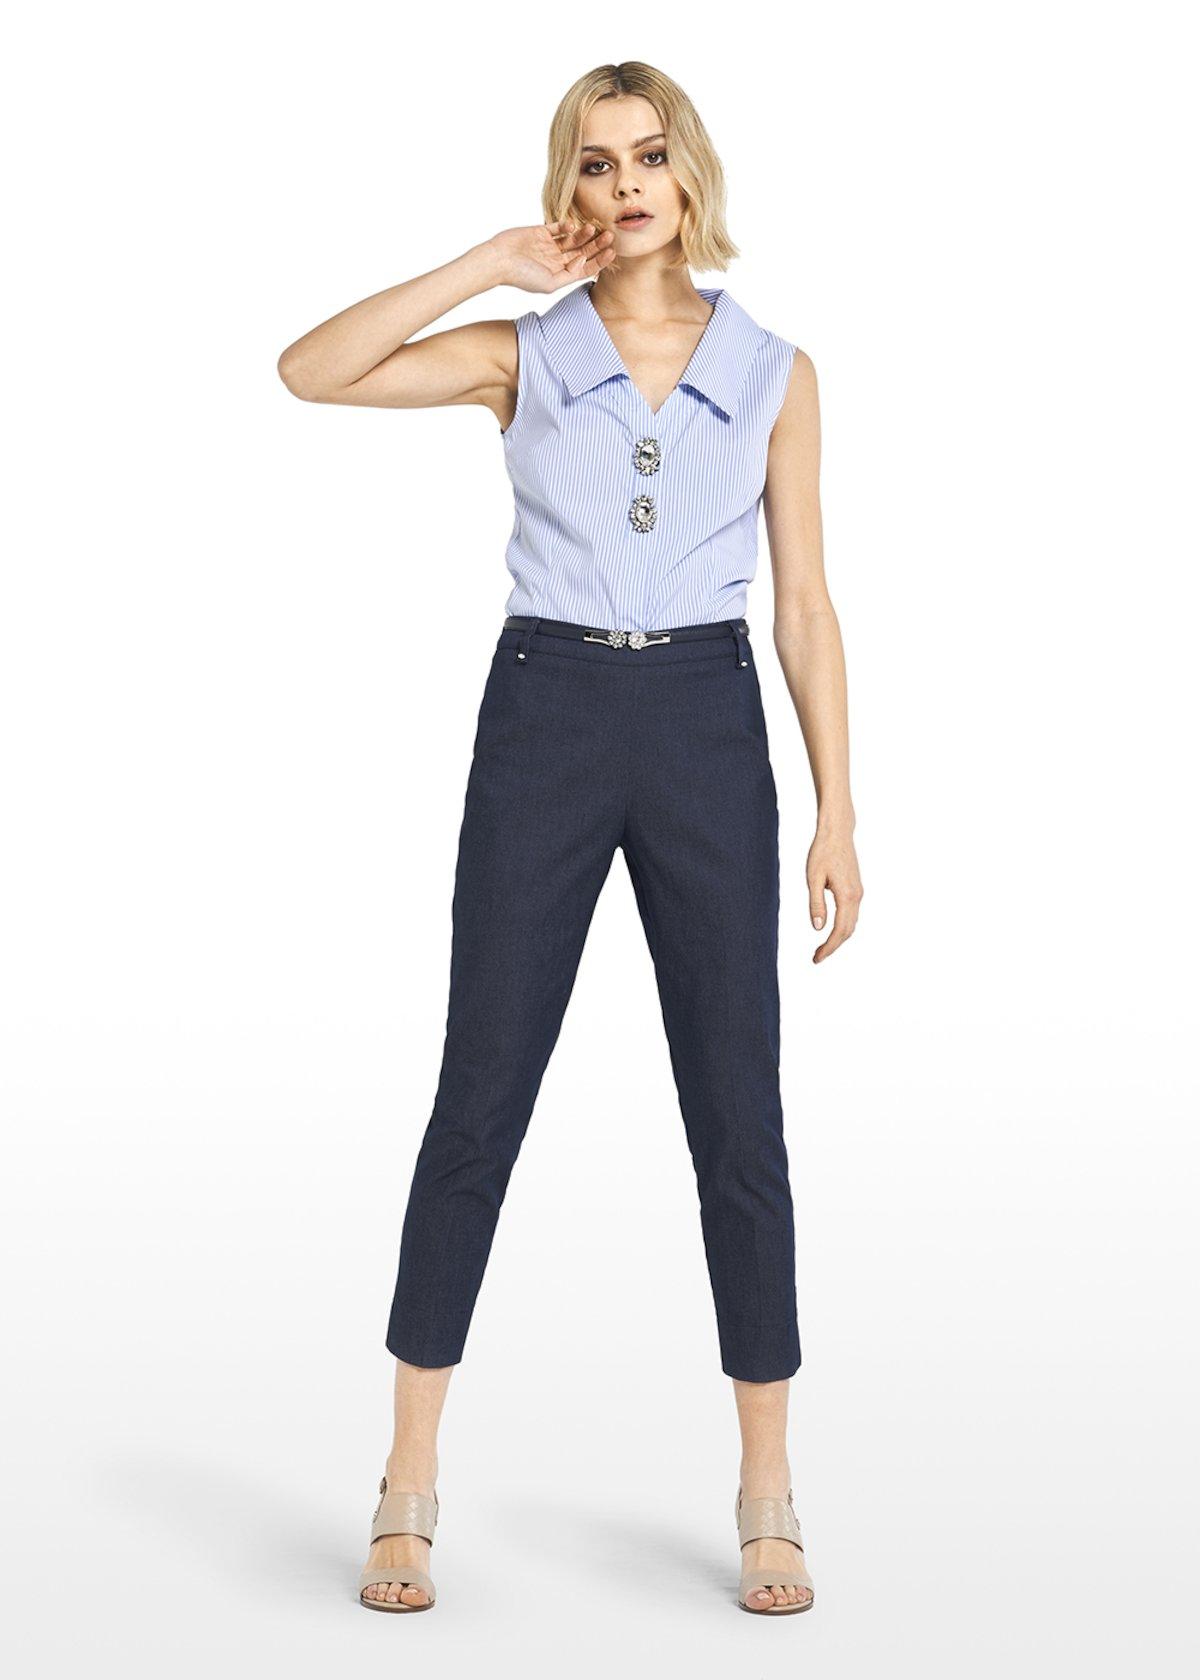 Preston denim Capri trousers with rhinestone details - Blue - Woman